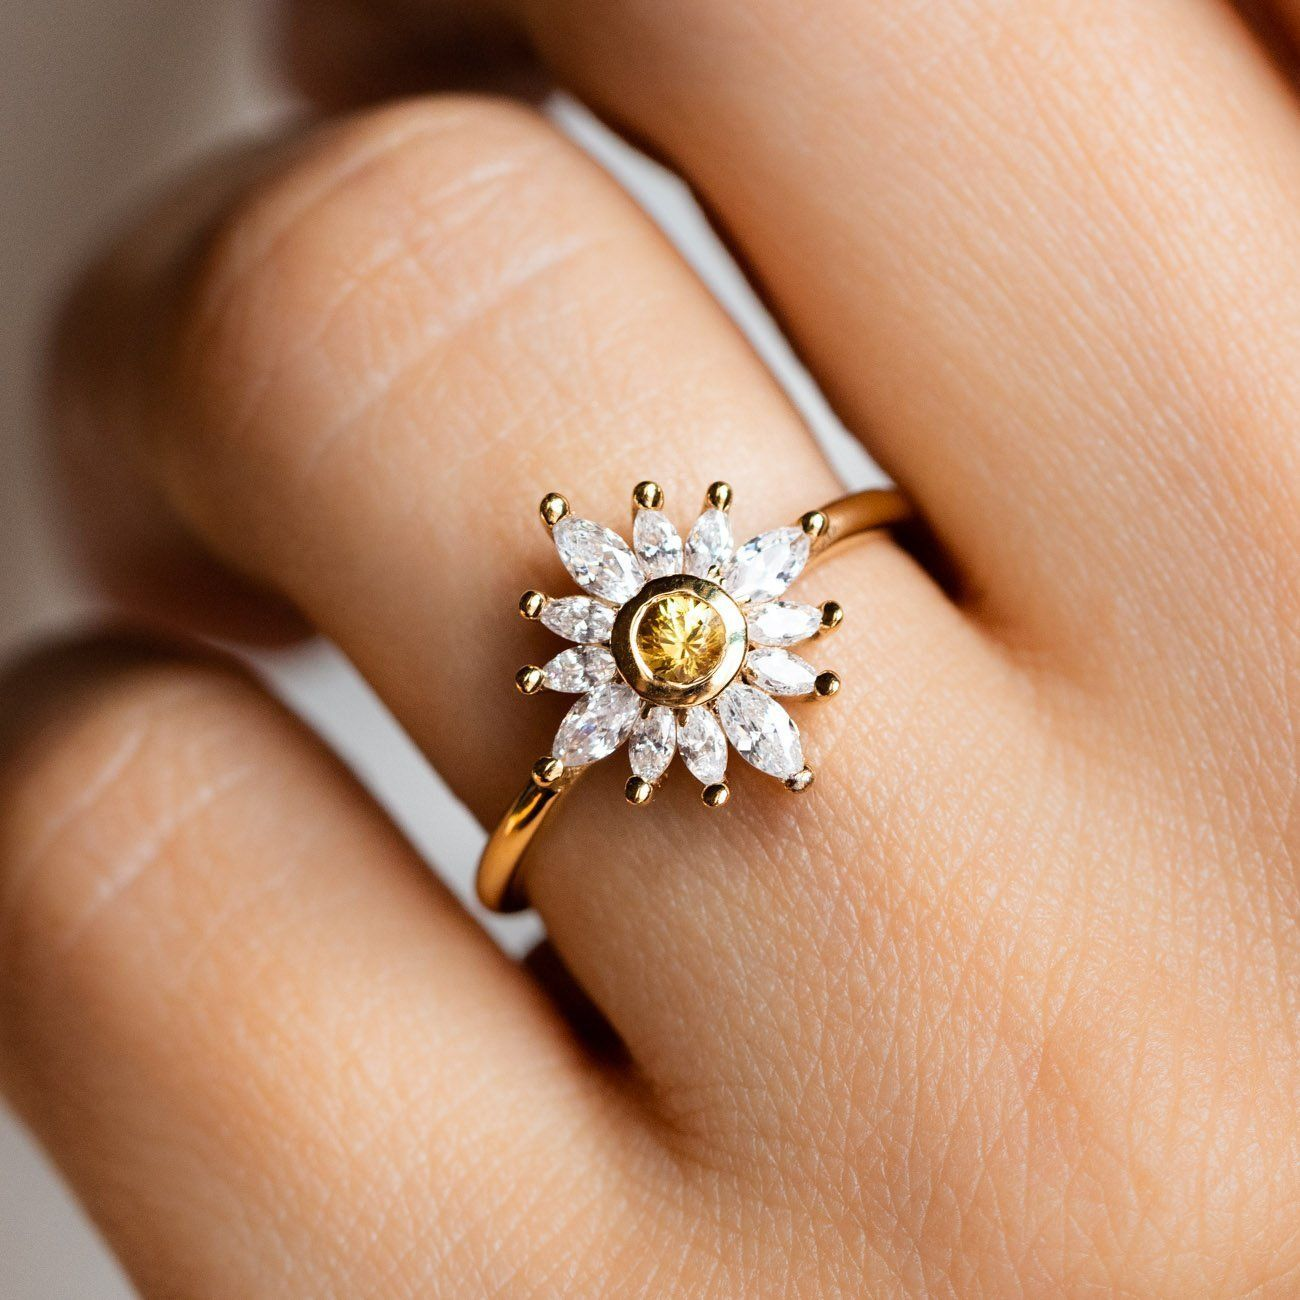 Hazy Daydream Sapphire Sunflower Ring Pink tourmaline